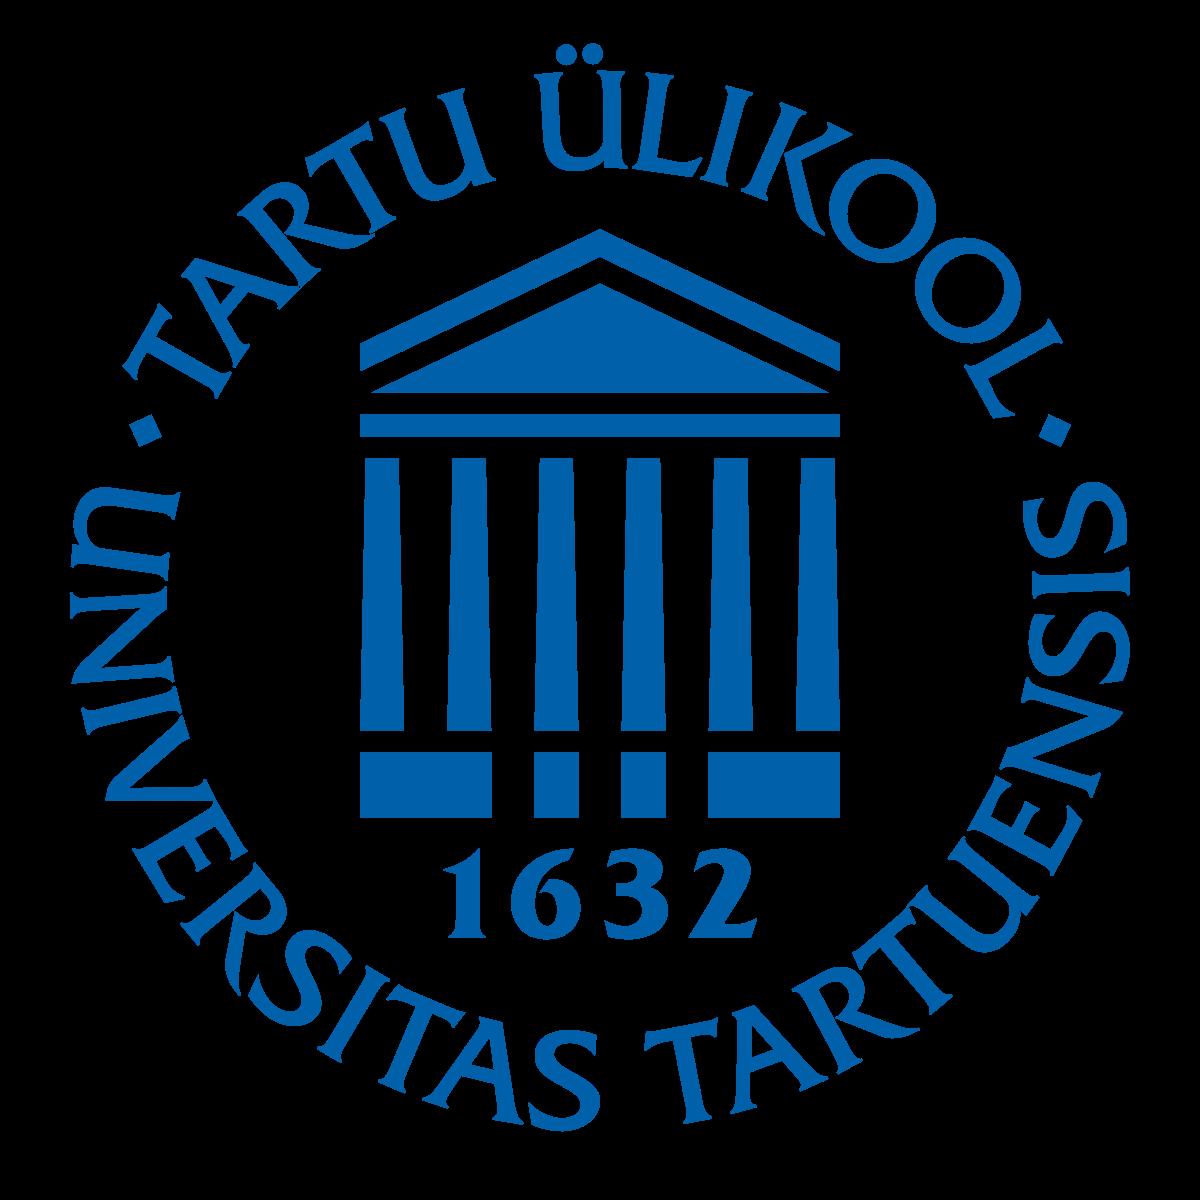 https://biotoopia.ee/wp-content/uploads/2021/06/University-of-Tartu-Estonia.png